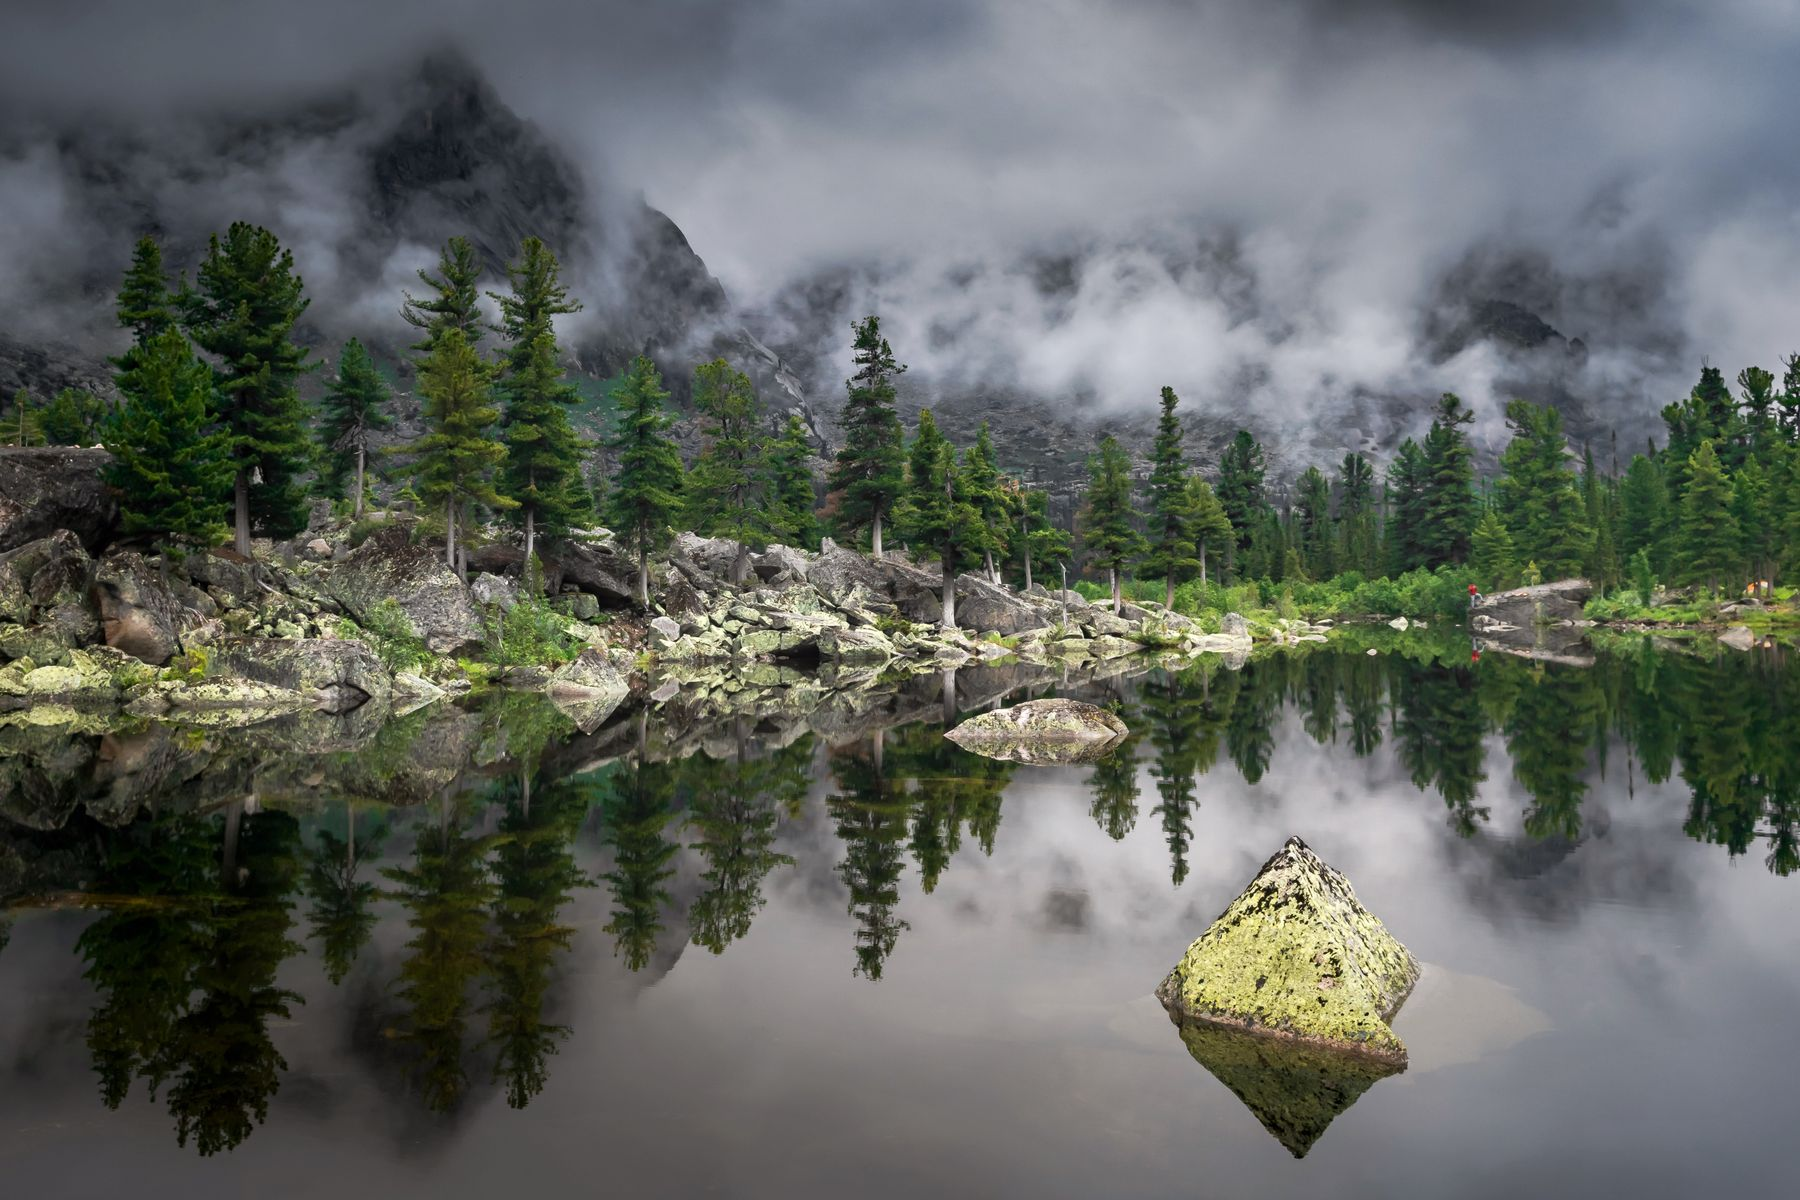 Пирамида озера Художников ергаки сибирь красноярский озерохудожников камень горы облака пасмурно тайга лес вода отражение